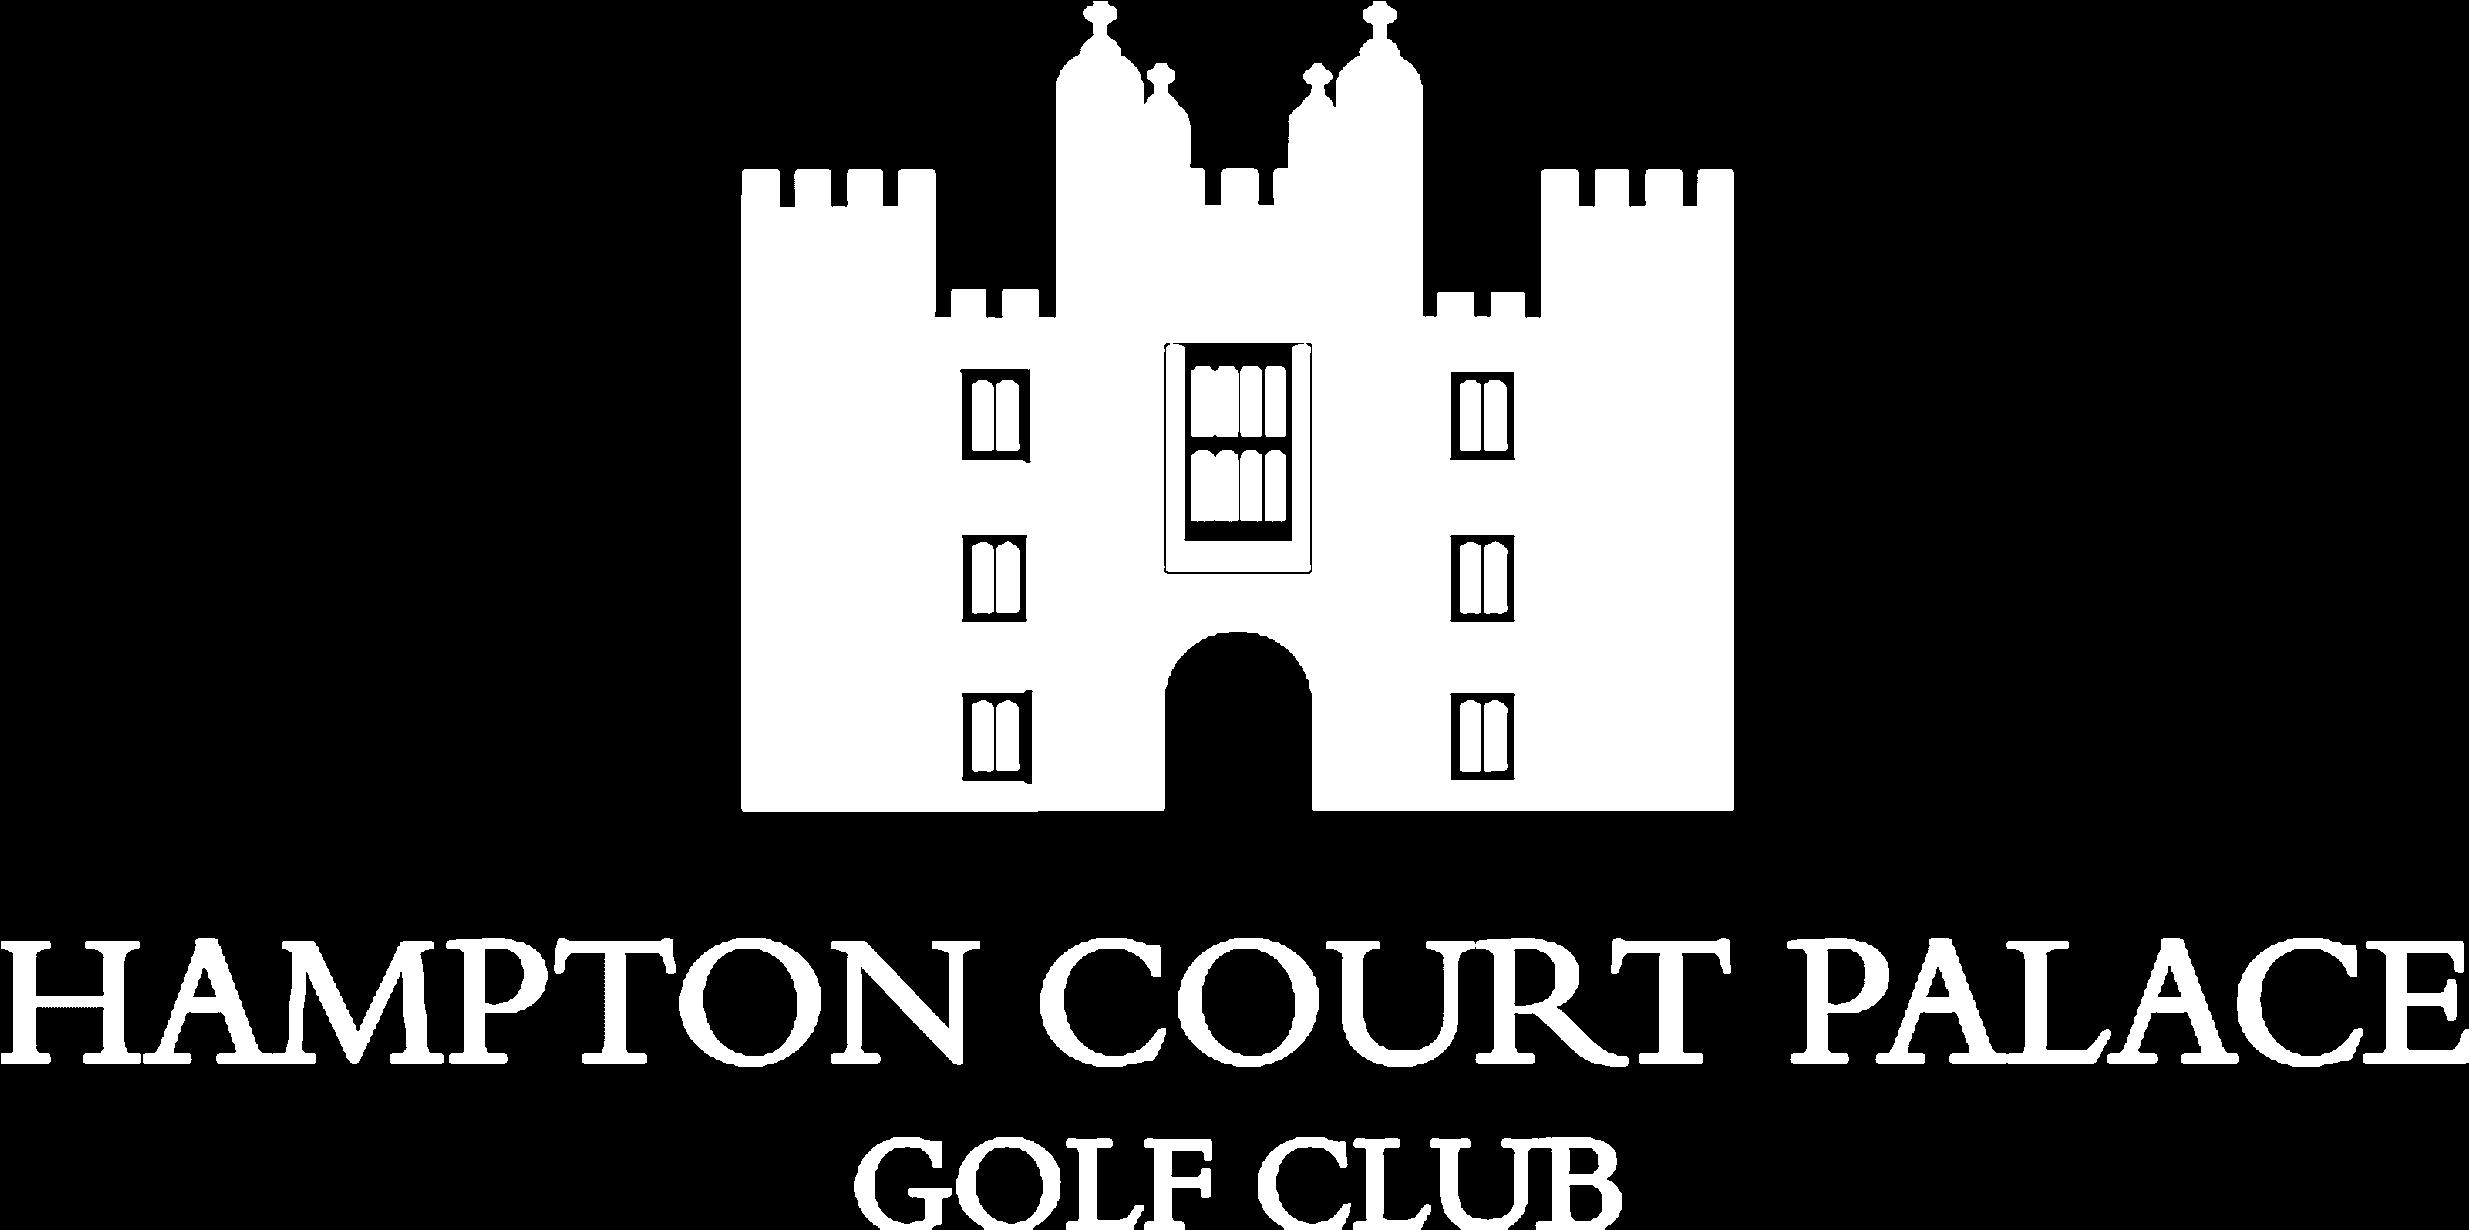 584-5844862_crown-golf-hampton-court-palace-golf-club-logo